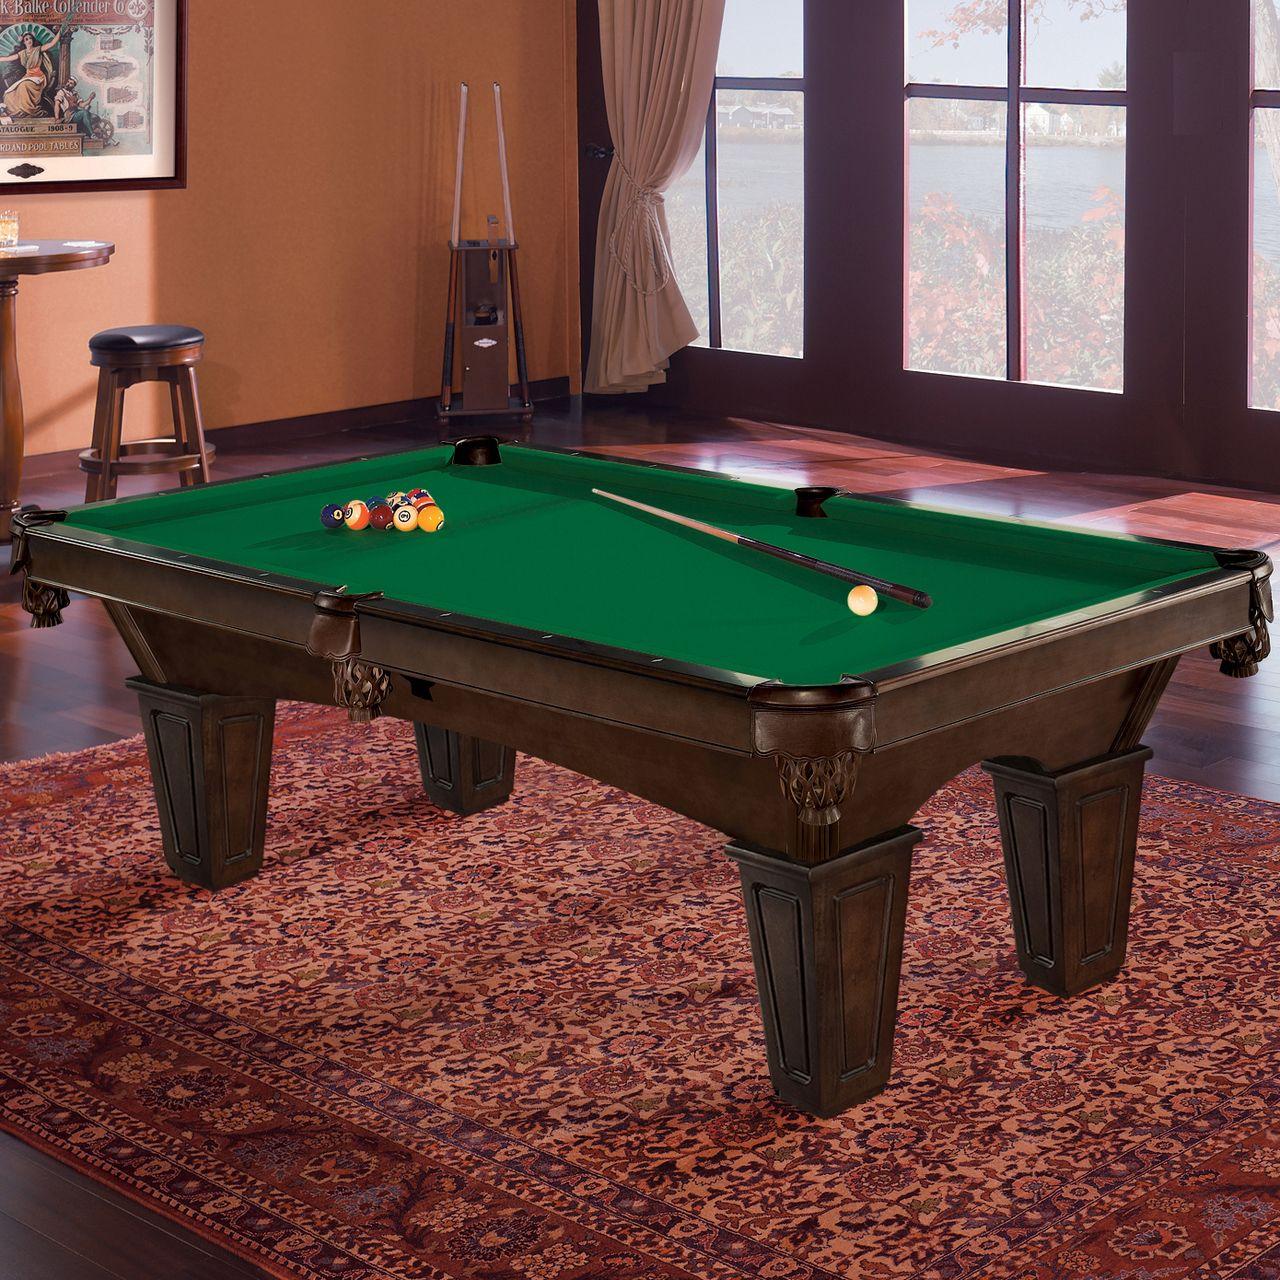 The Brunswick Glen Oaks billiard table embodies all the